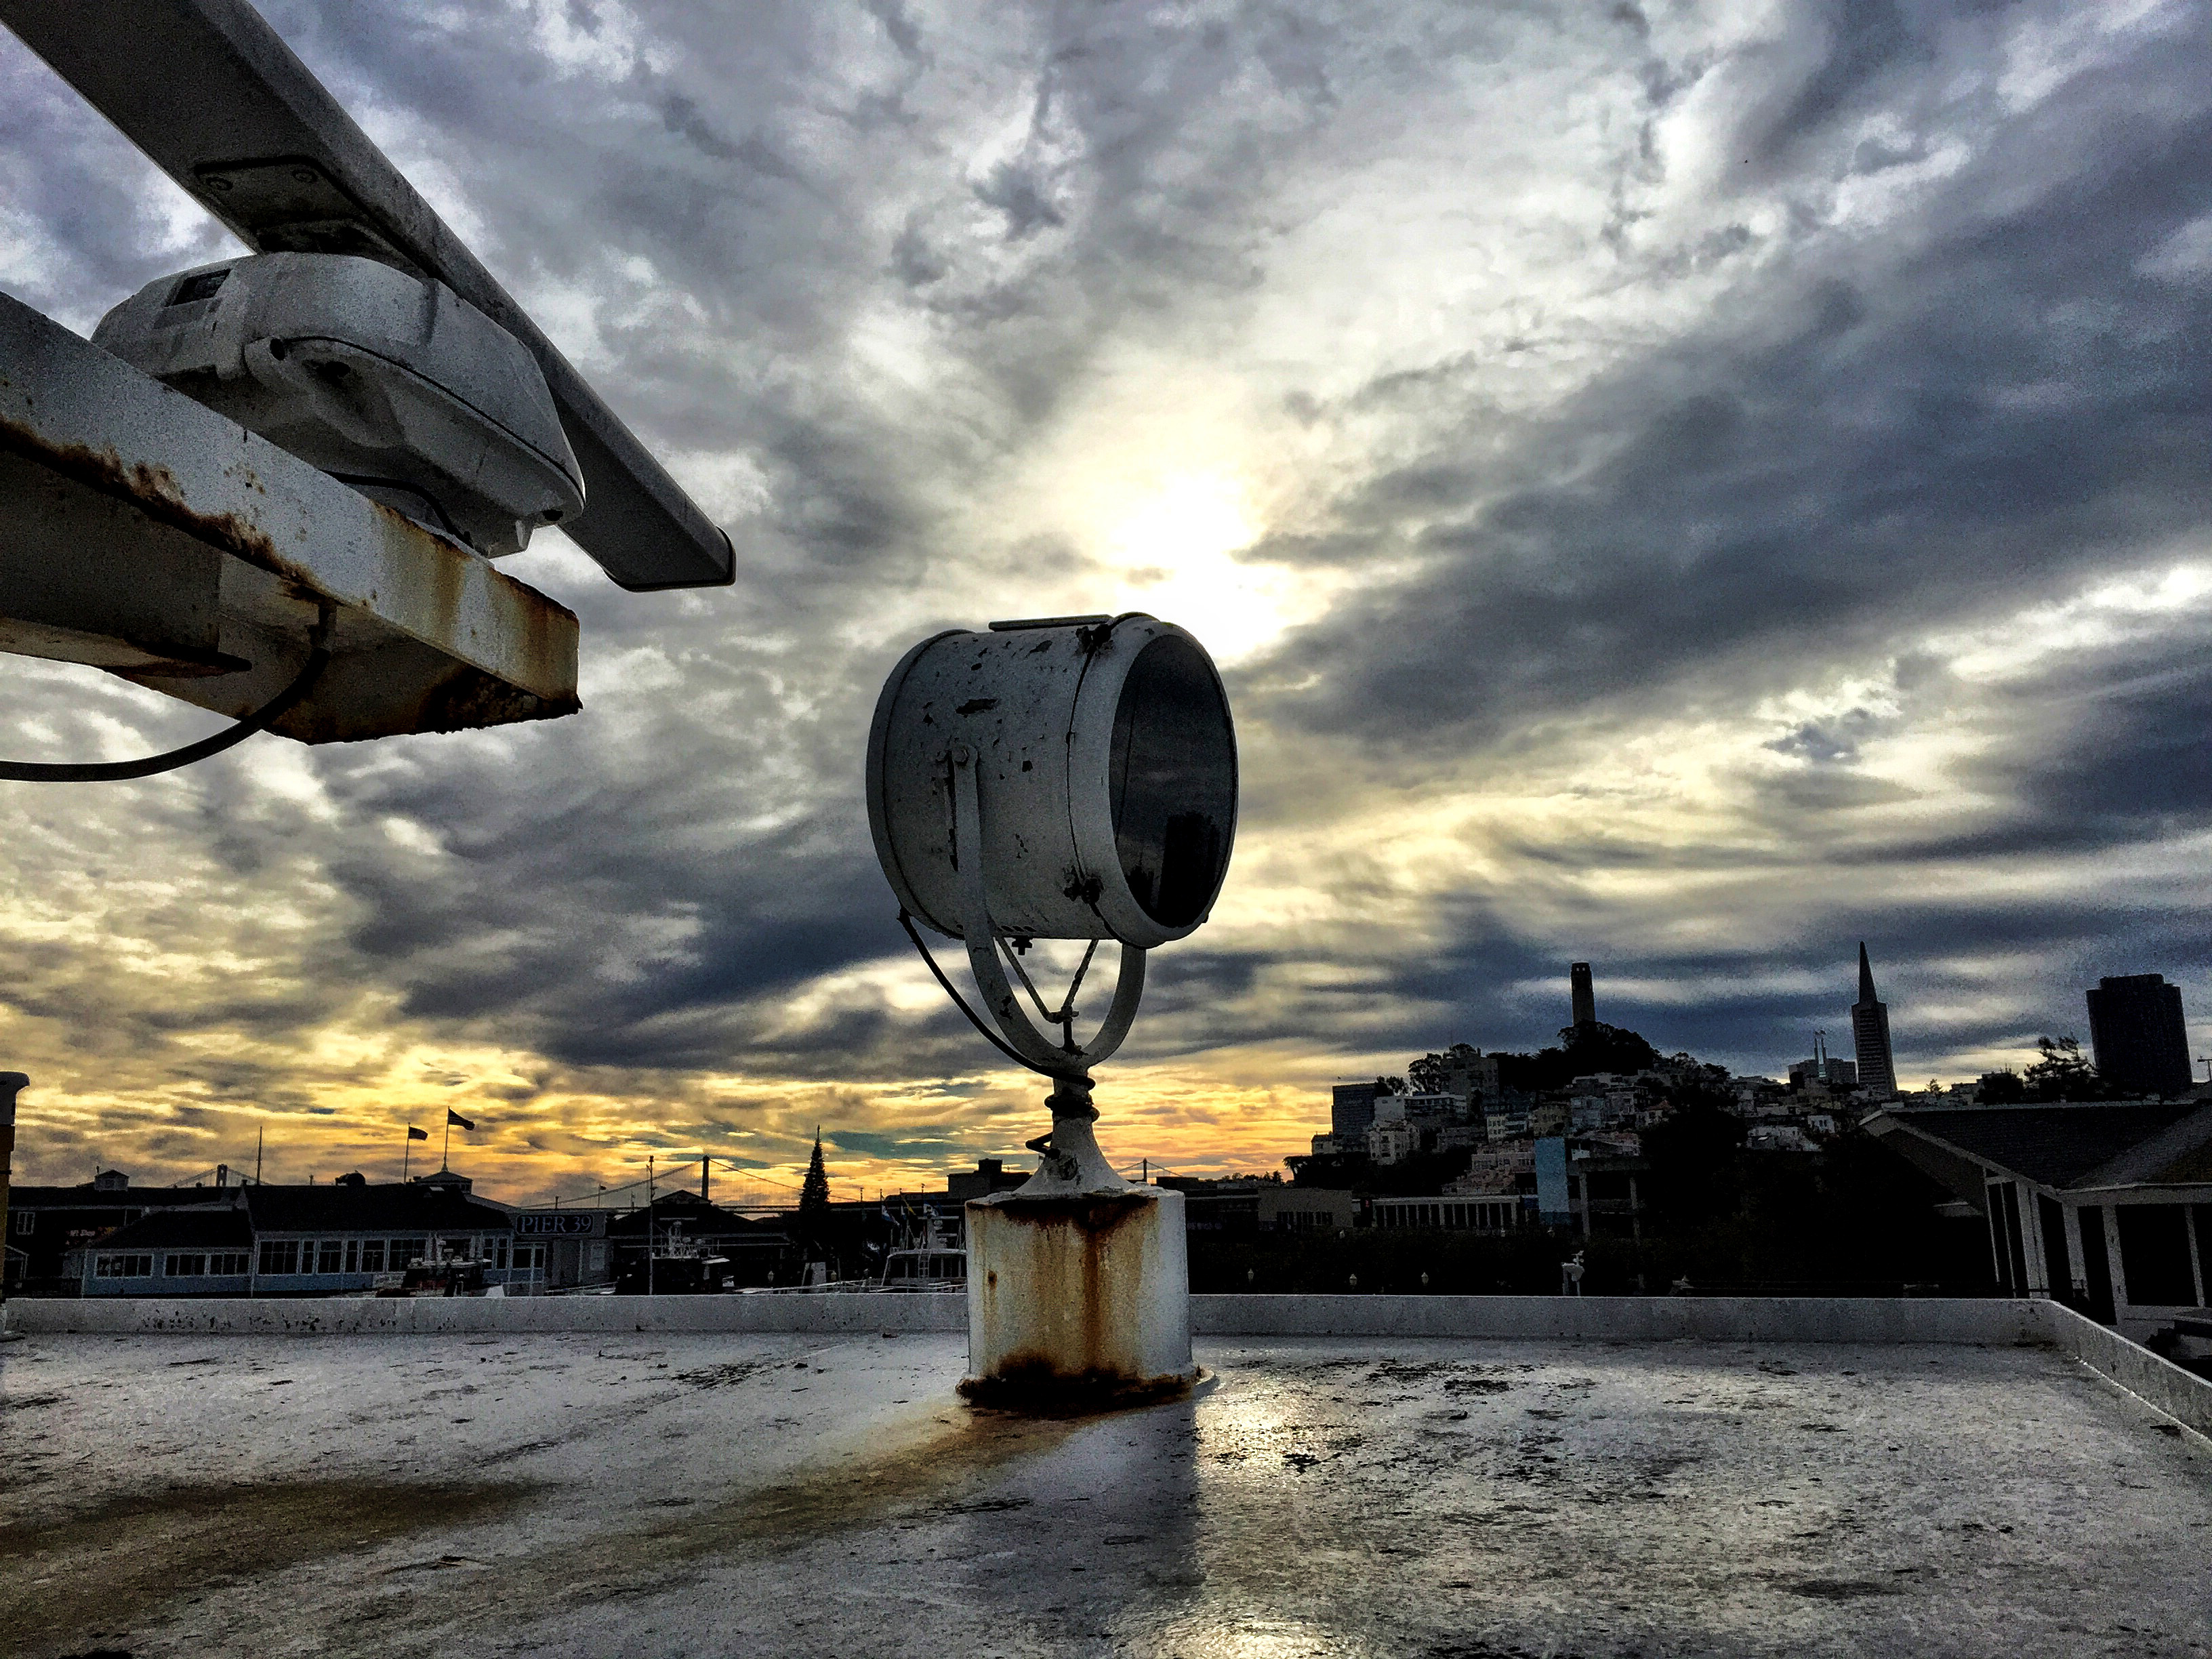 Spotlight by Vincent Atos